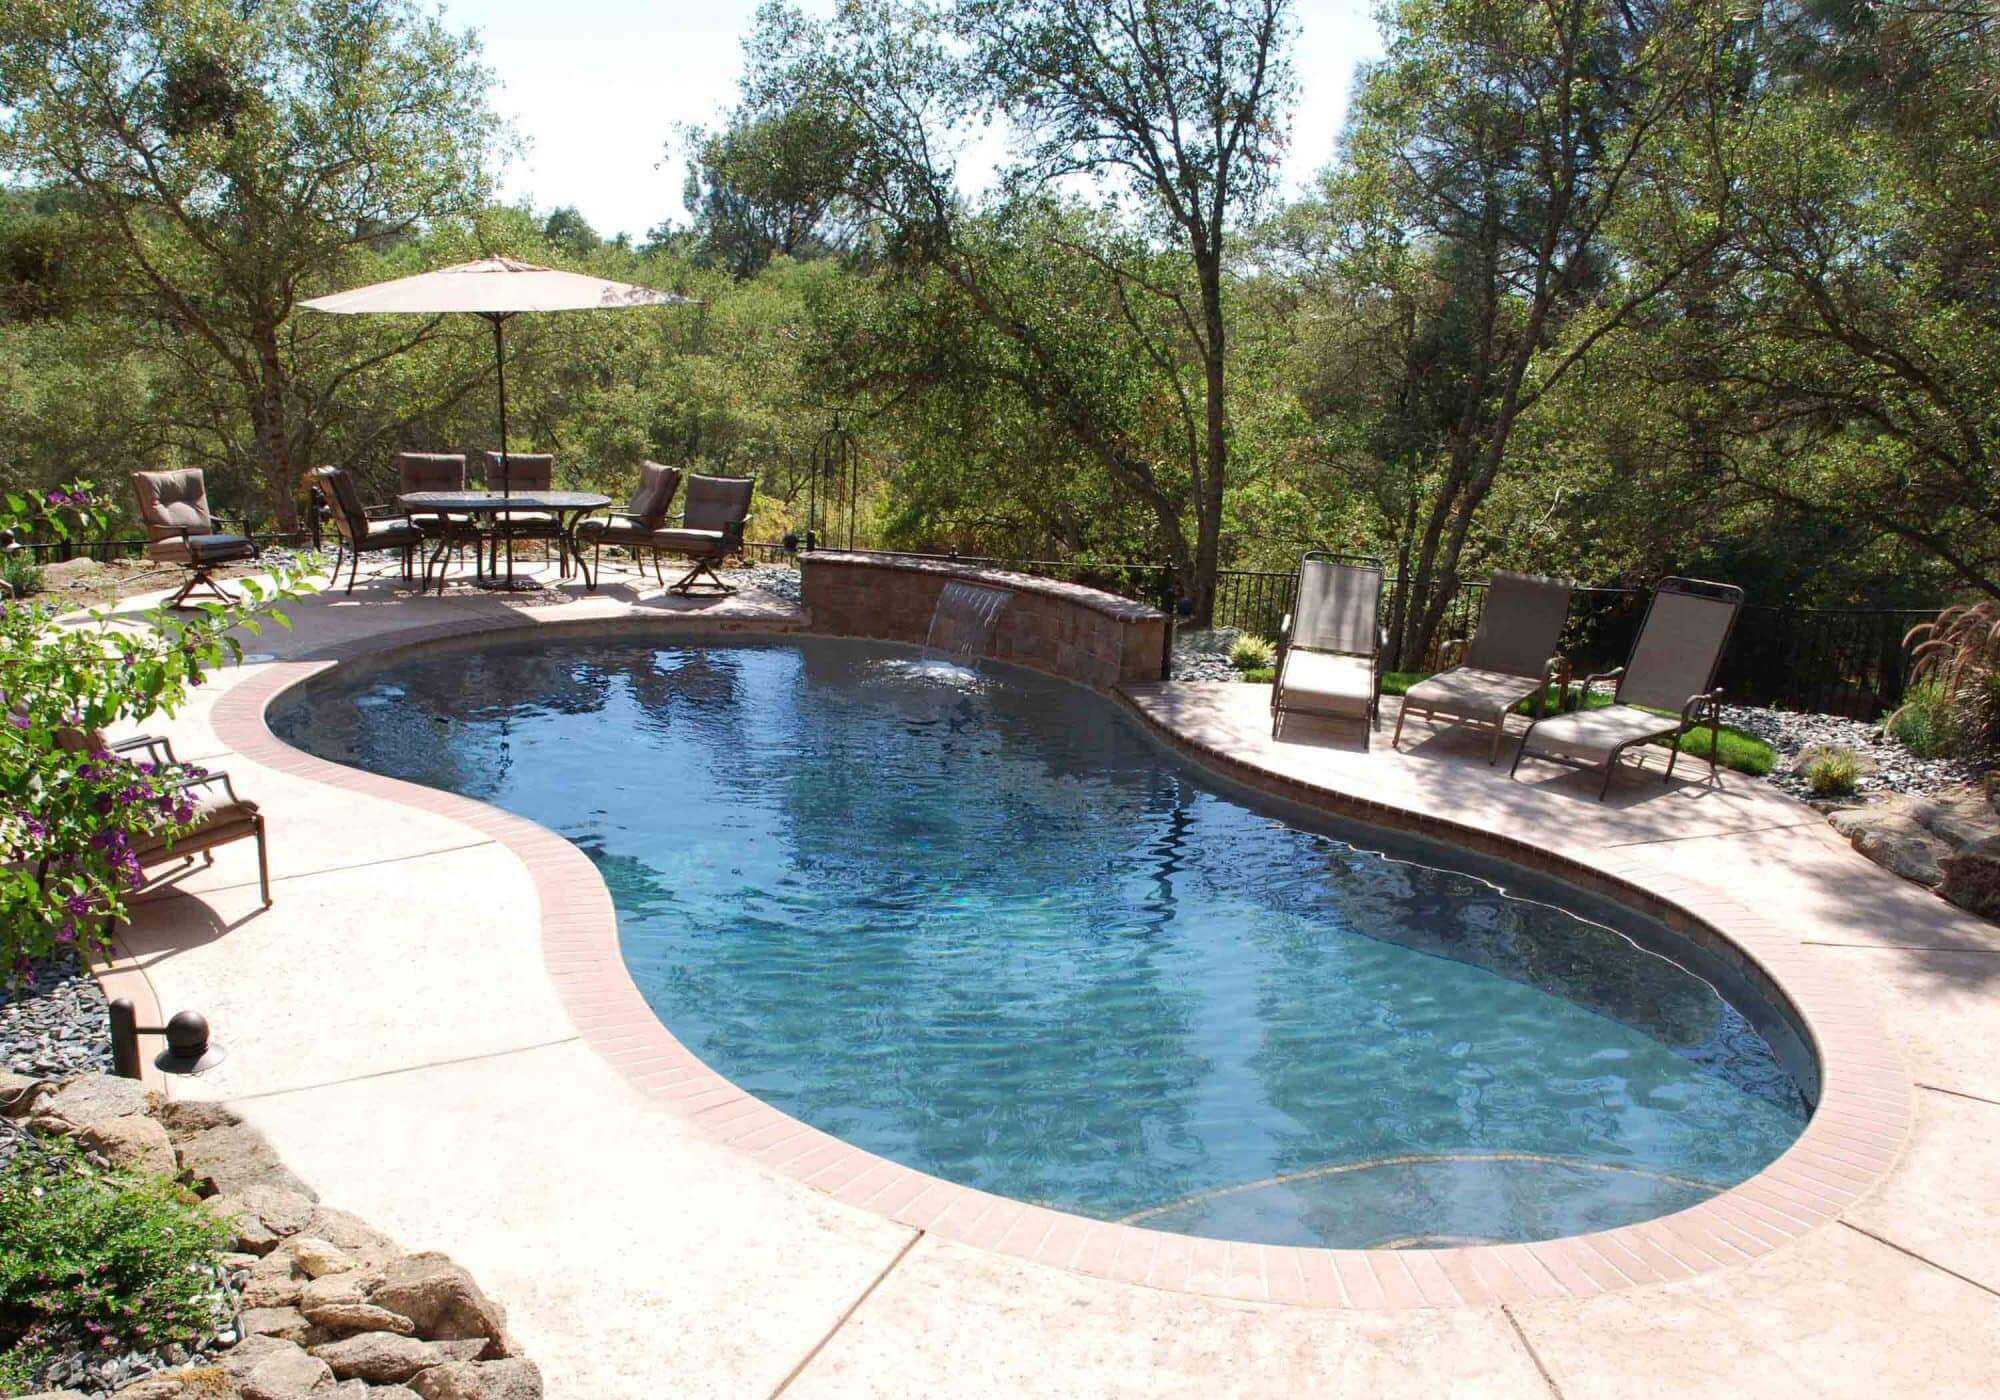 Cookie Cutter Pools A Sacramento Area